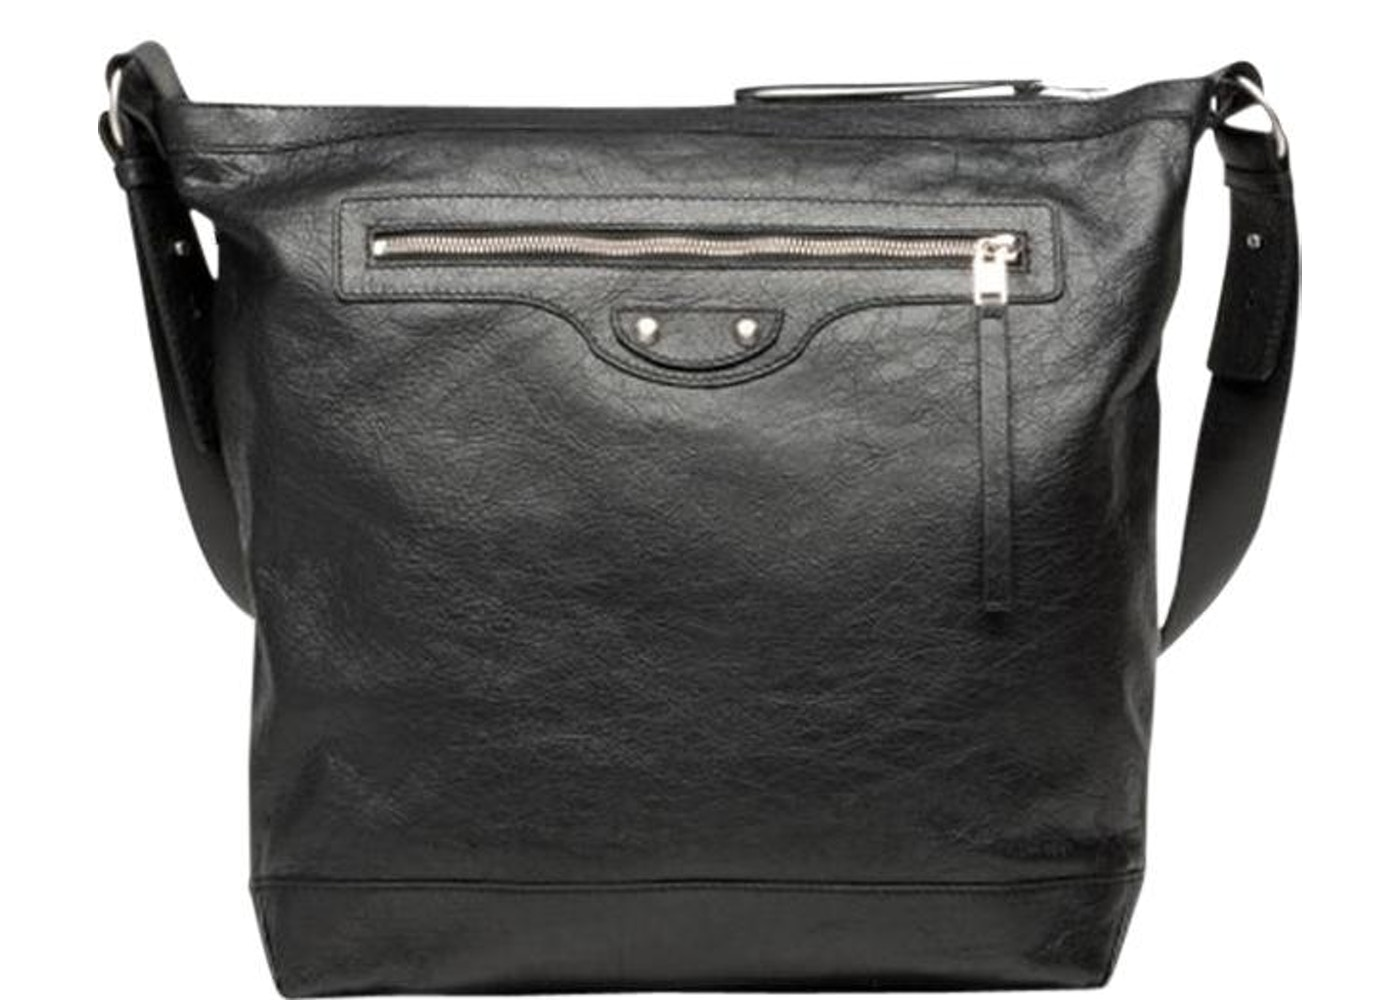 bb6f89c55ef50 Balenciaga Messenger Bag Classic Black. Black